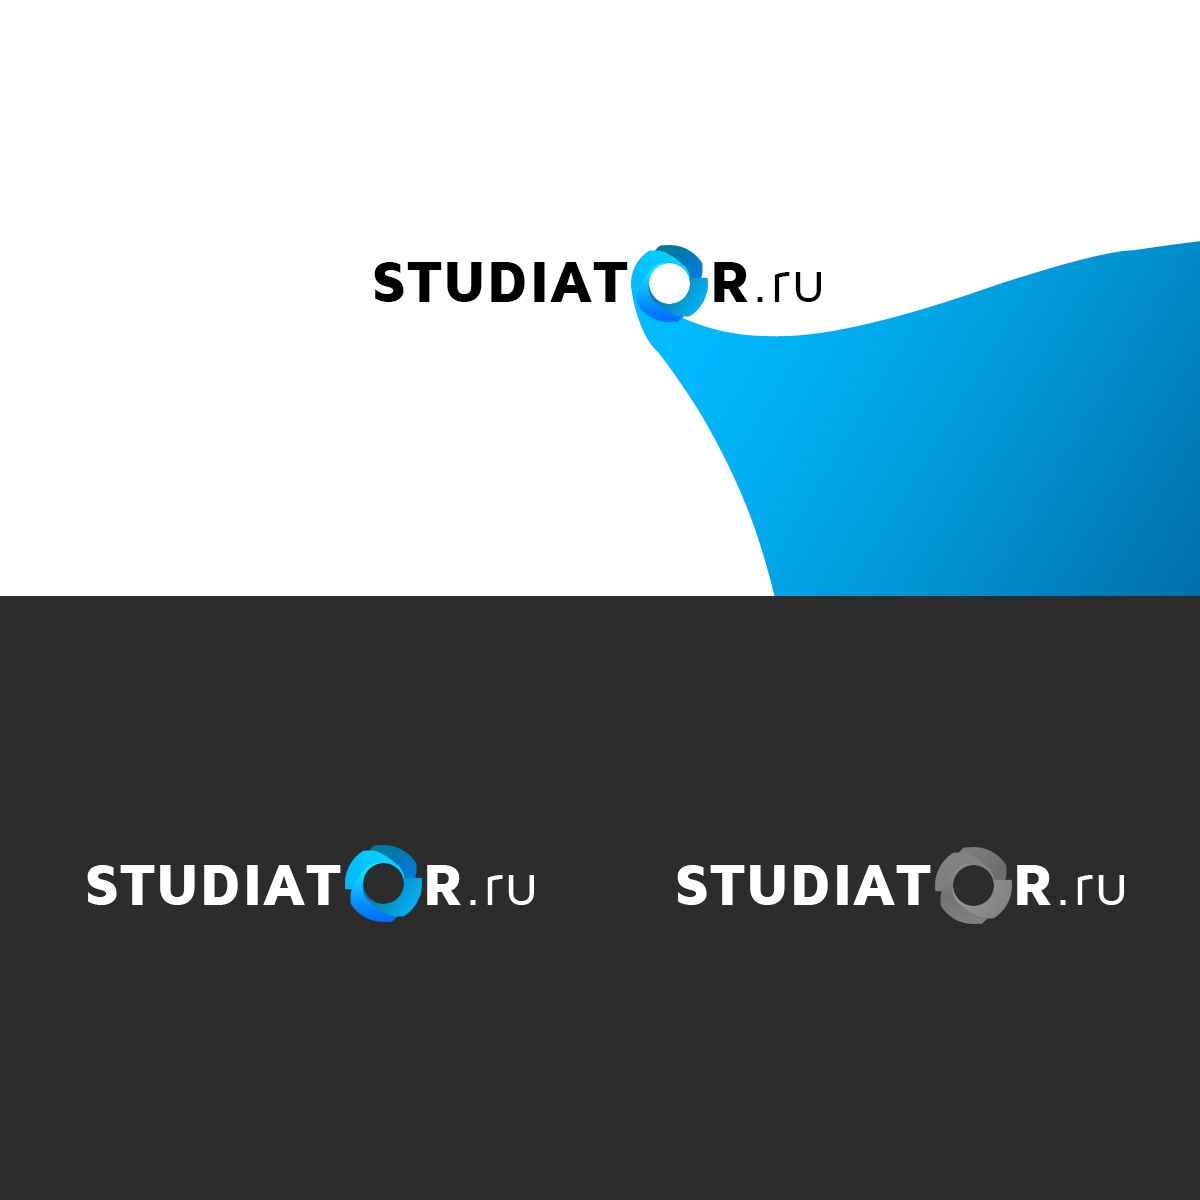 Логотип для каталога студий Веб-дизайна - дизайнер Muskin